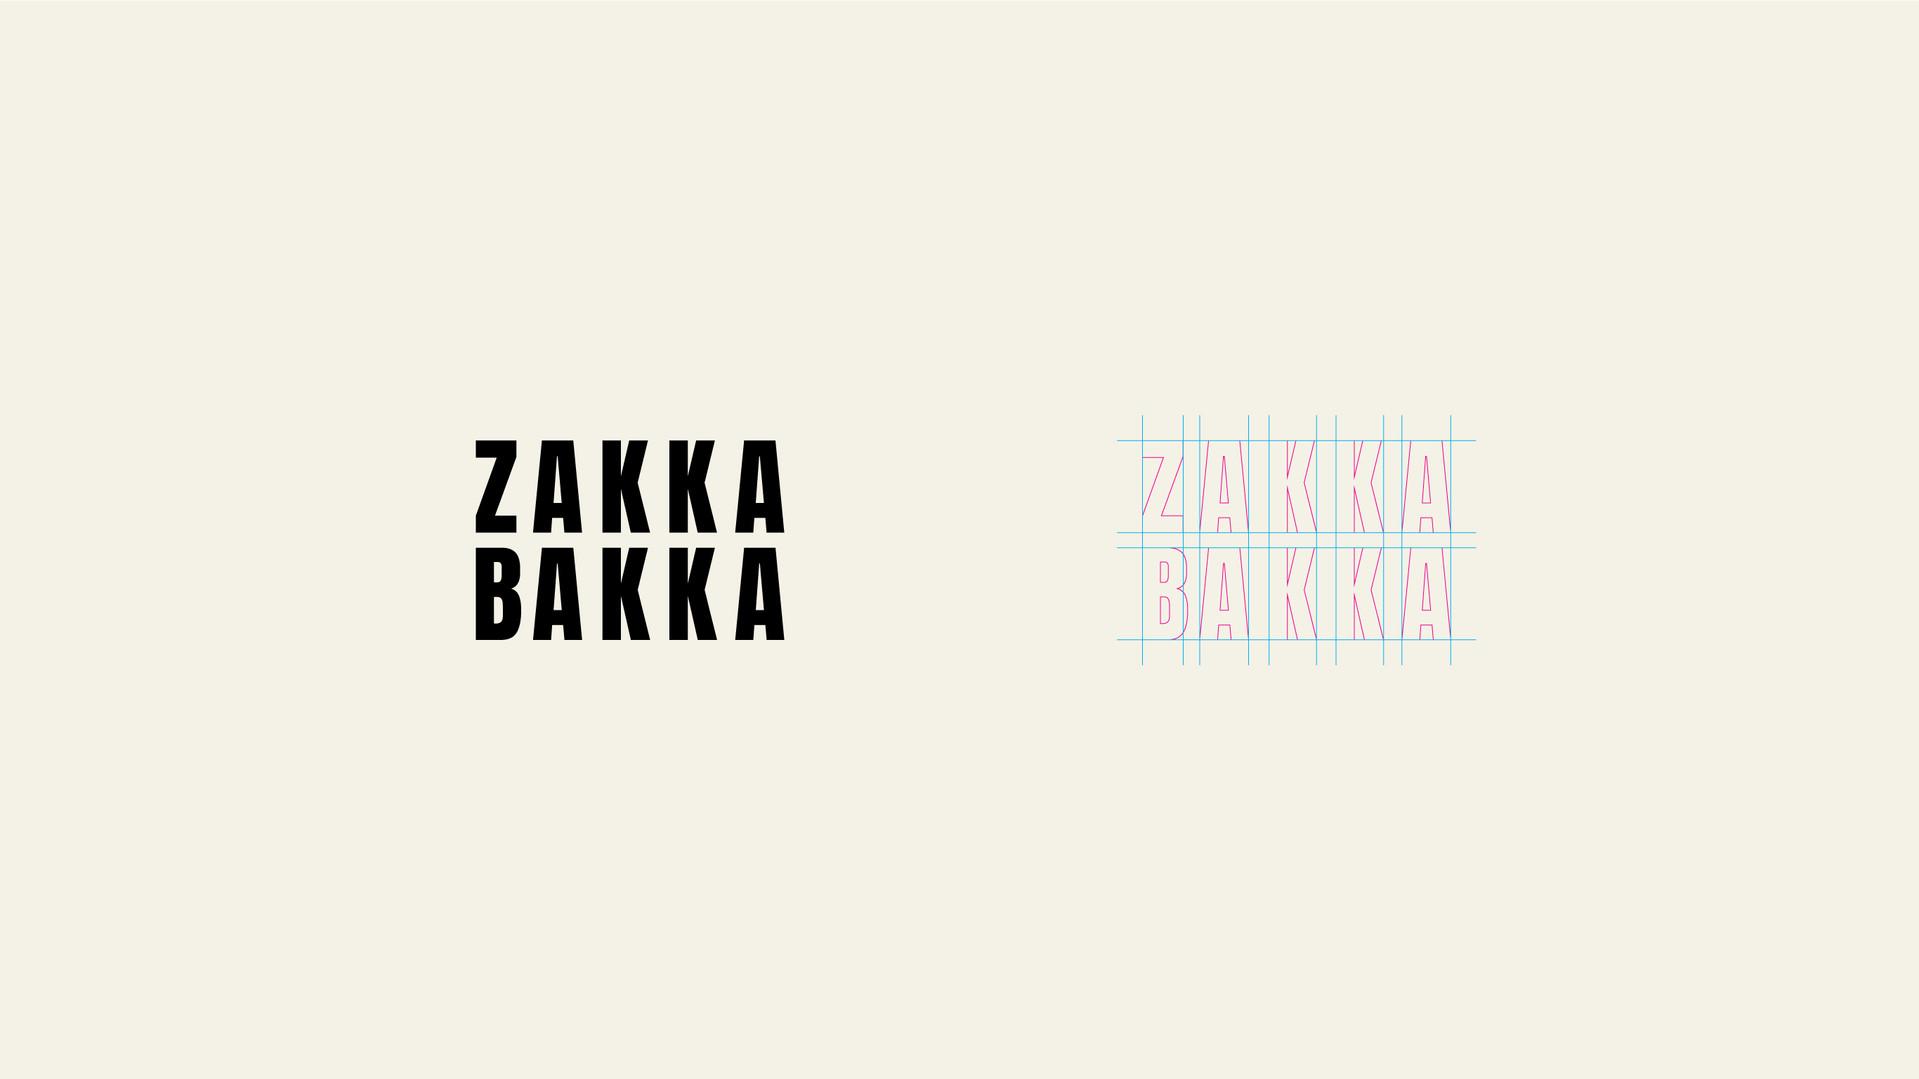 zakkabakka.com